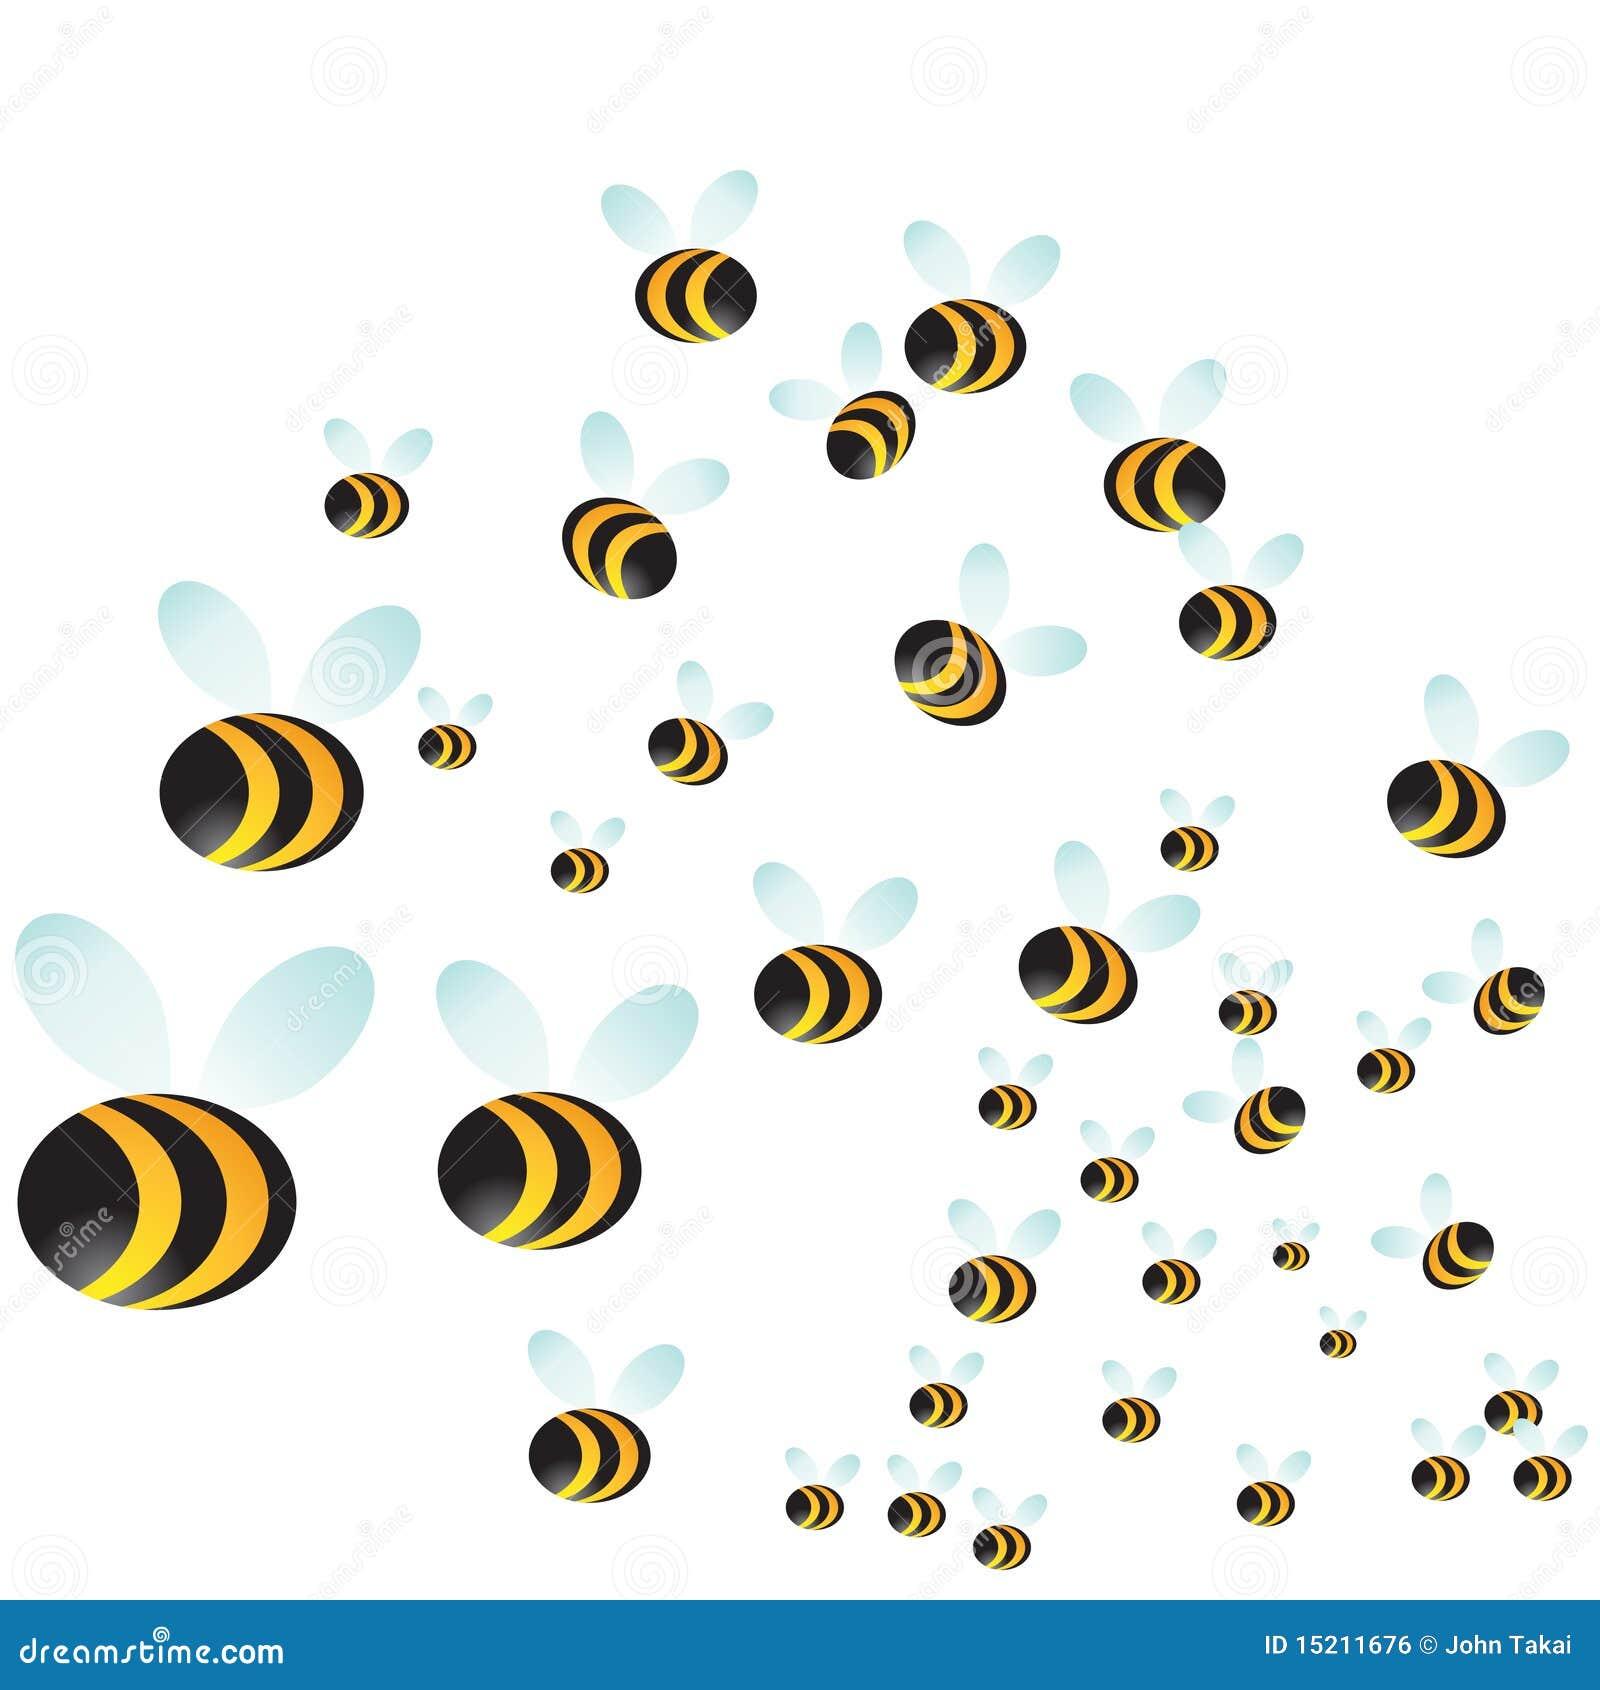 black paper wasps